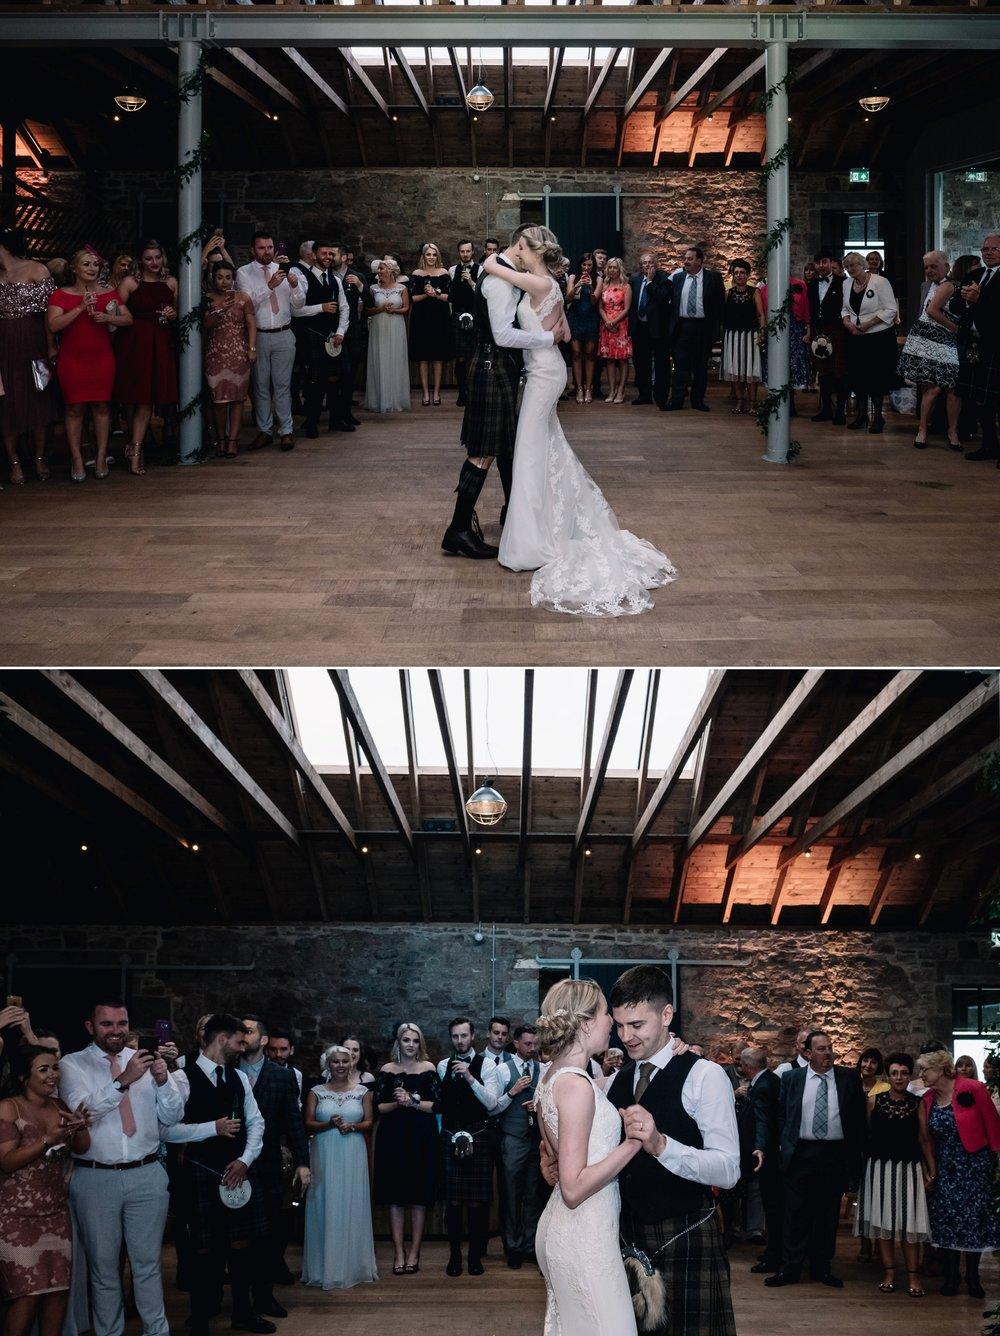 540-Rebeca-Tom-Wedding-Guardswell.JPG